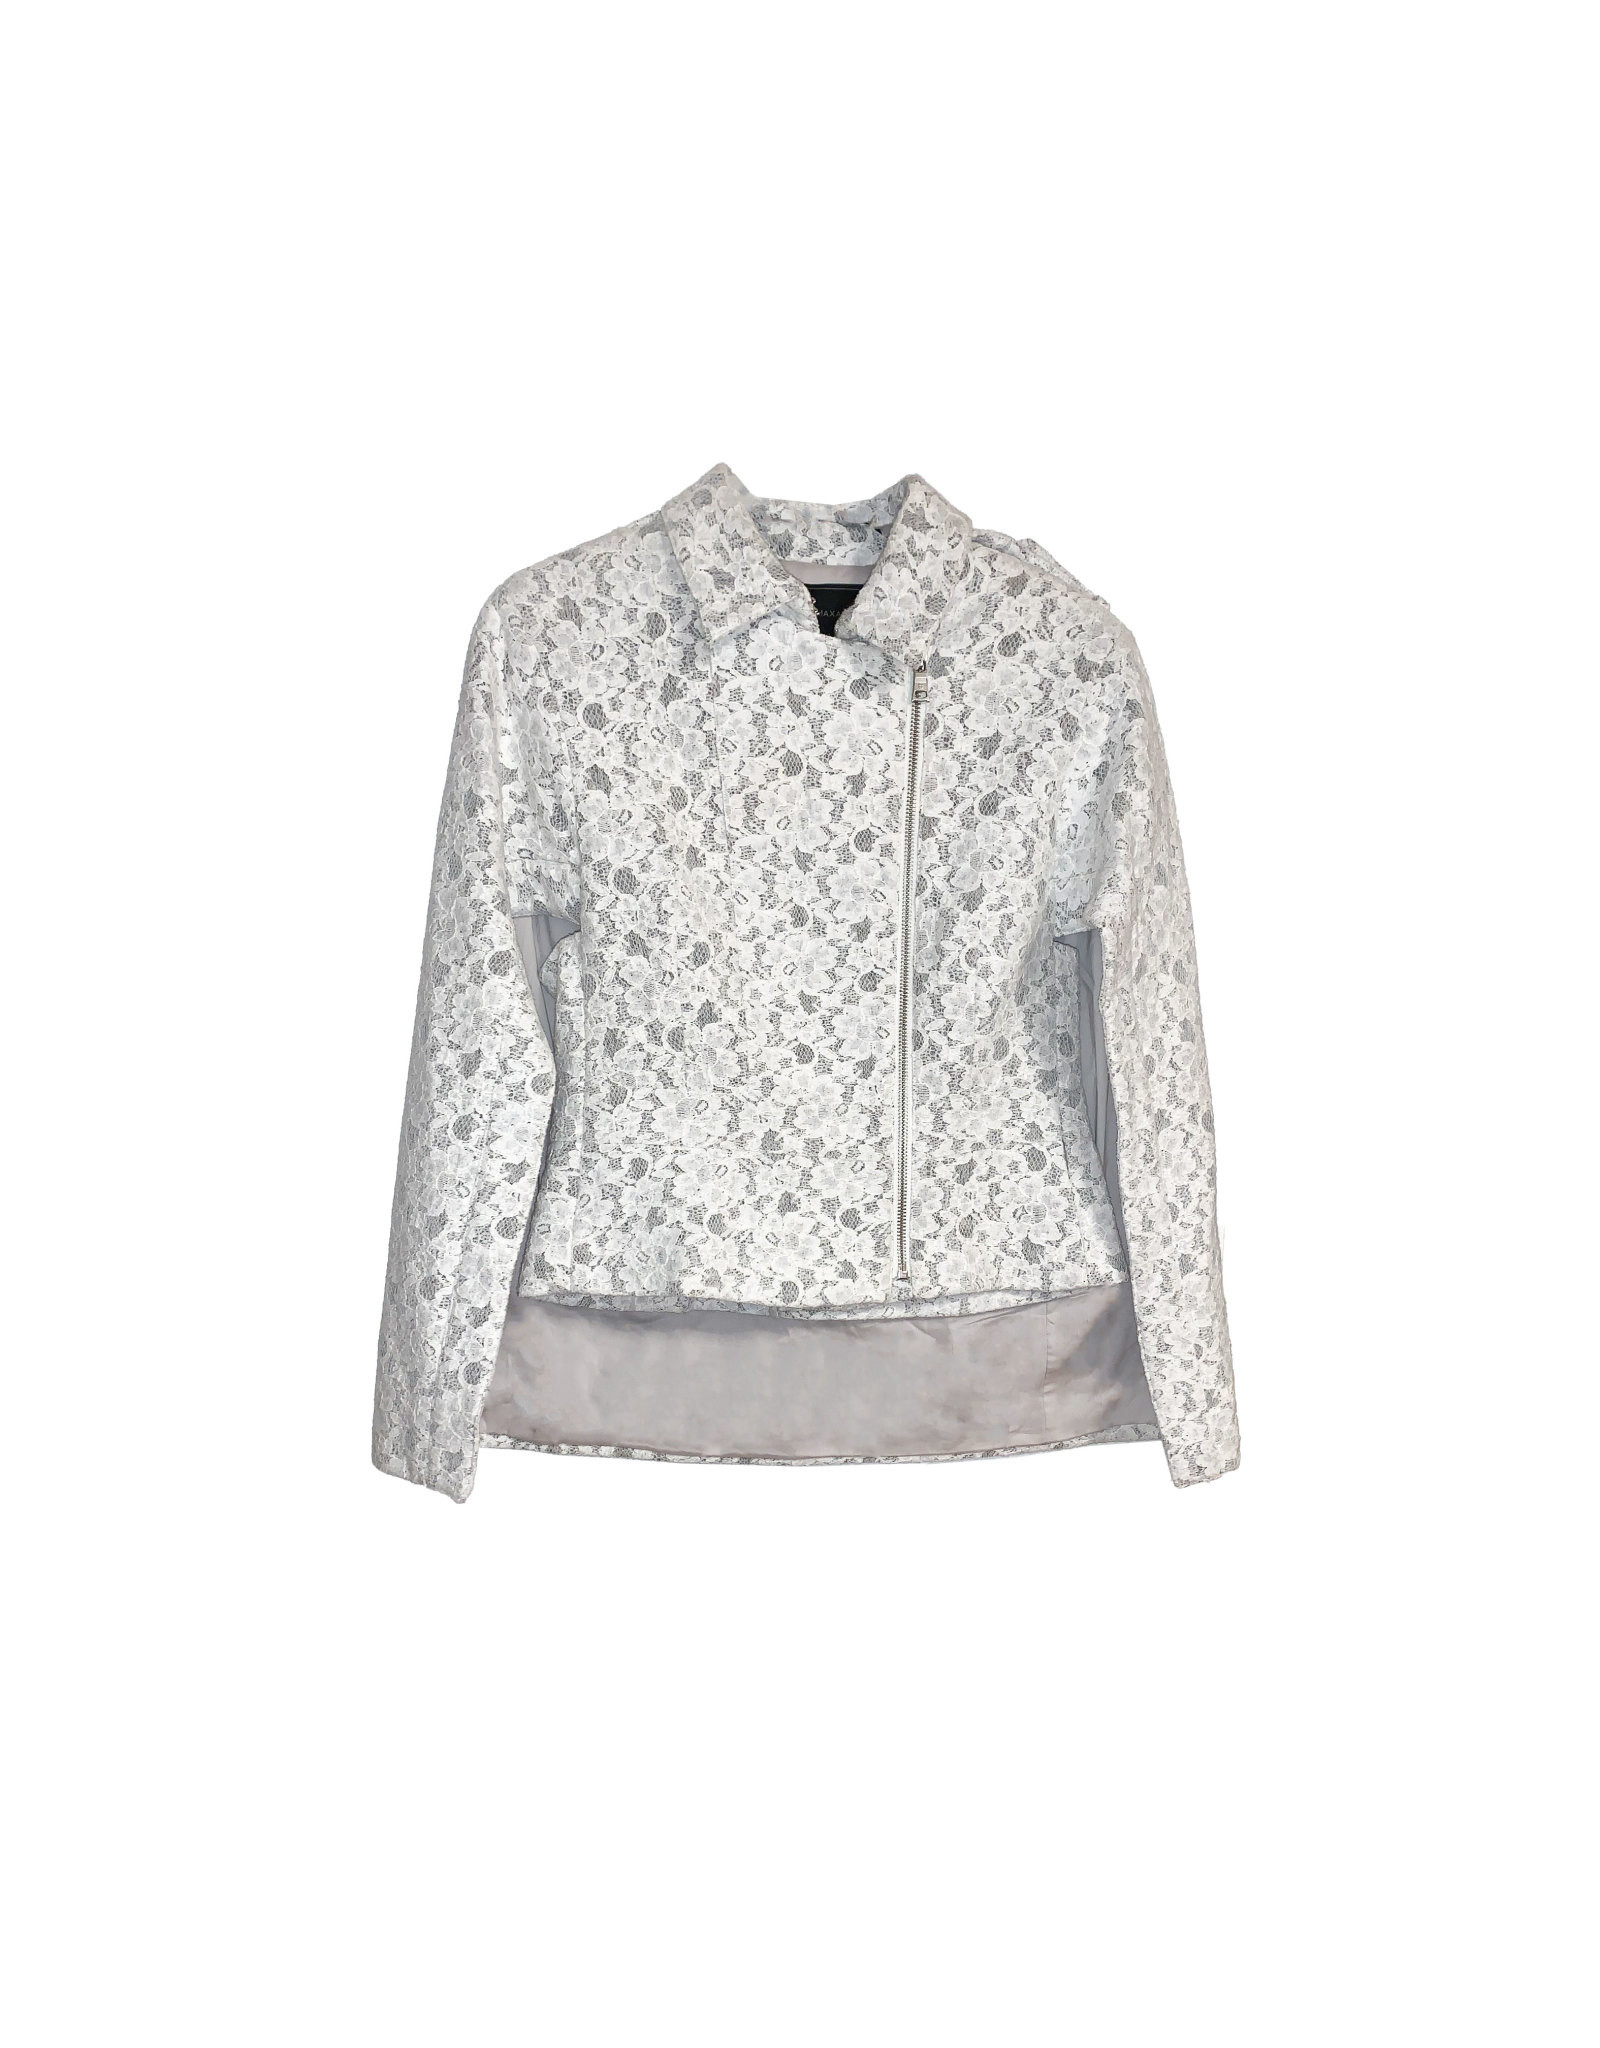 BCBG Maxazria BCBG Maxazria Floral Lace Jacket Cape